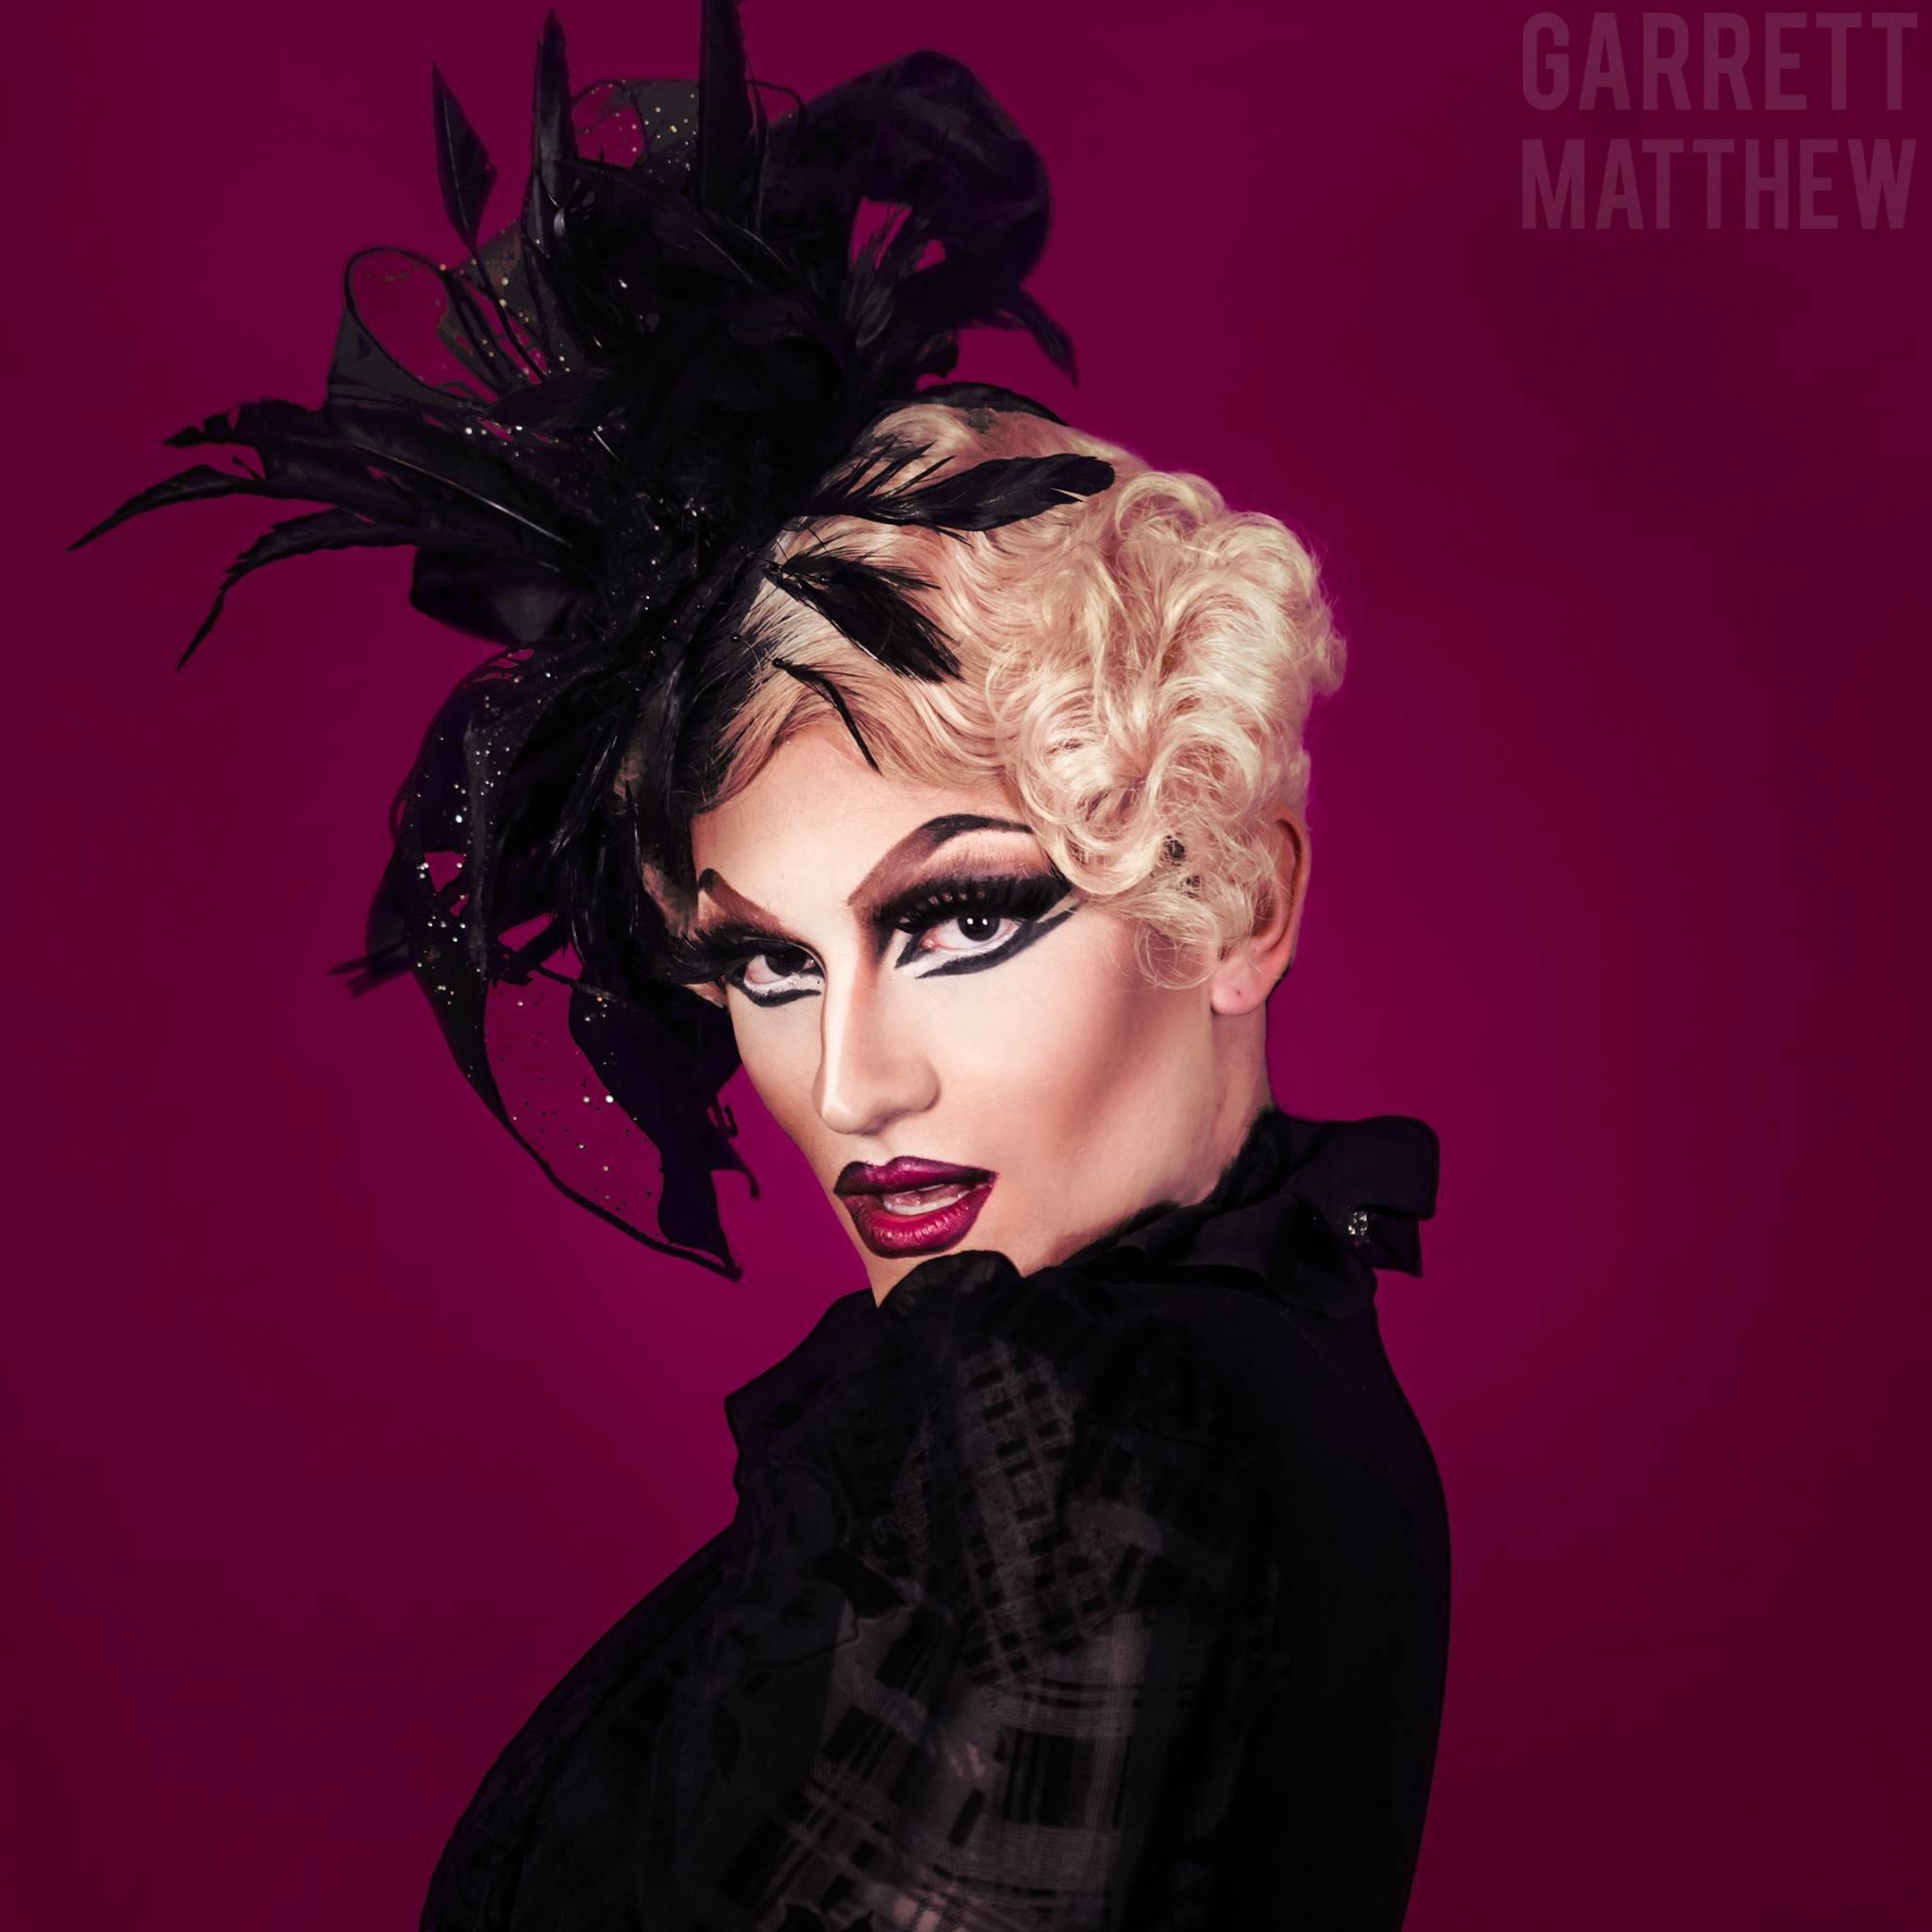 Iris Spectre - Photo by Garrett Matthew Photography